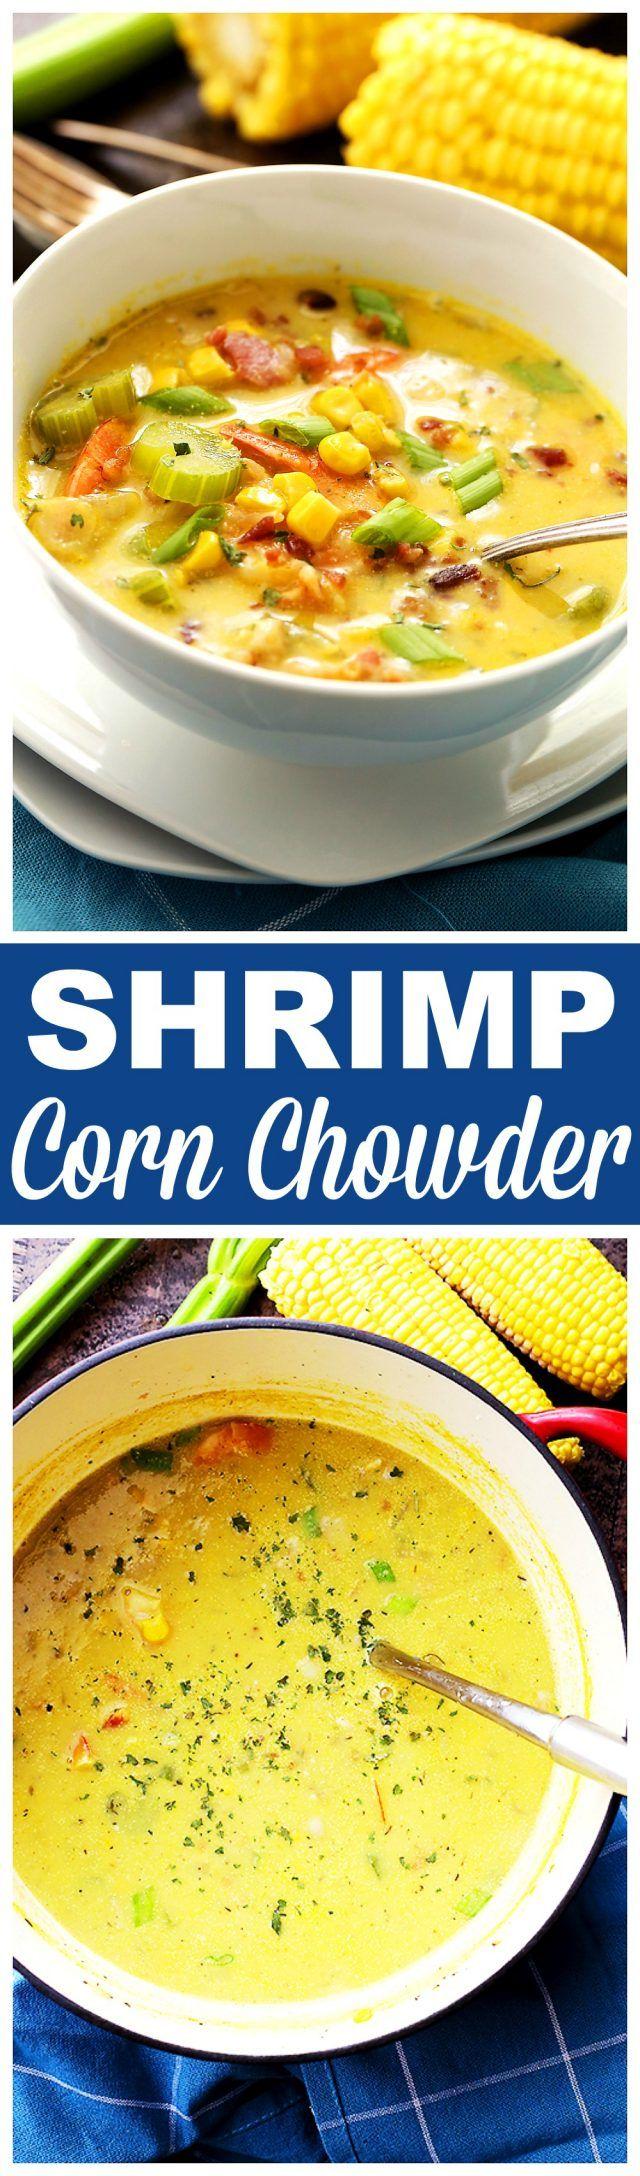 Shrimp Corn Chowder Recipe